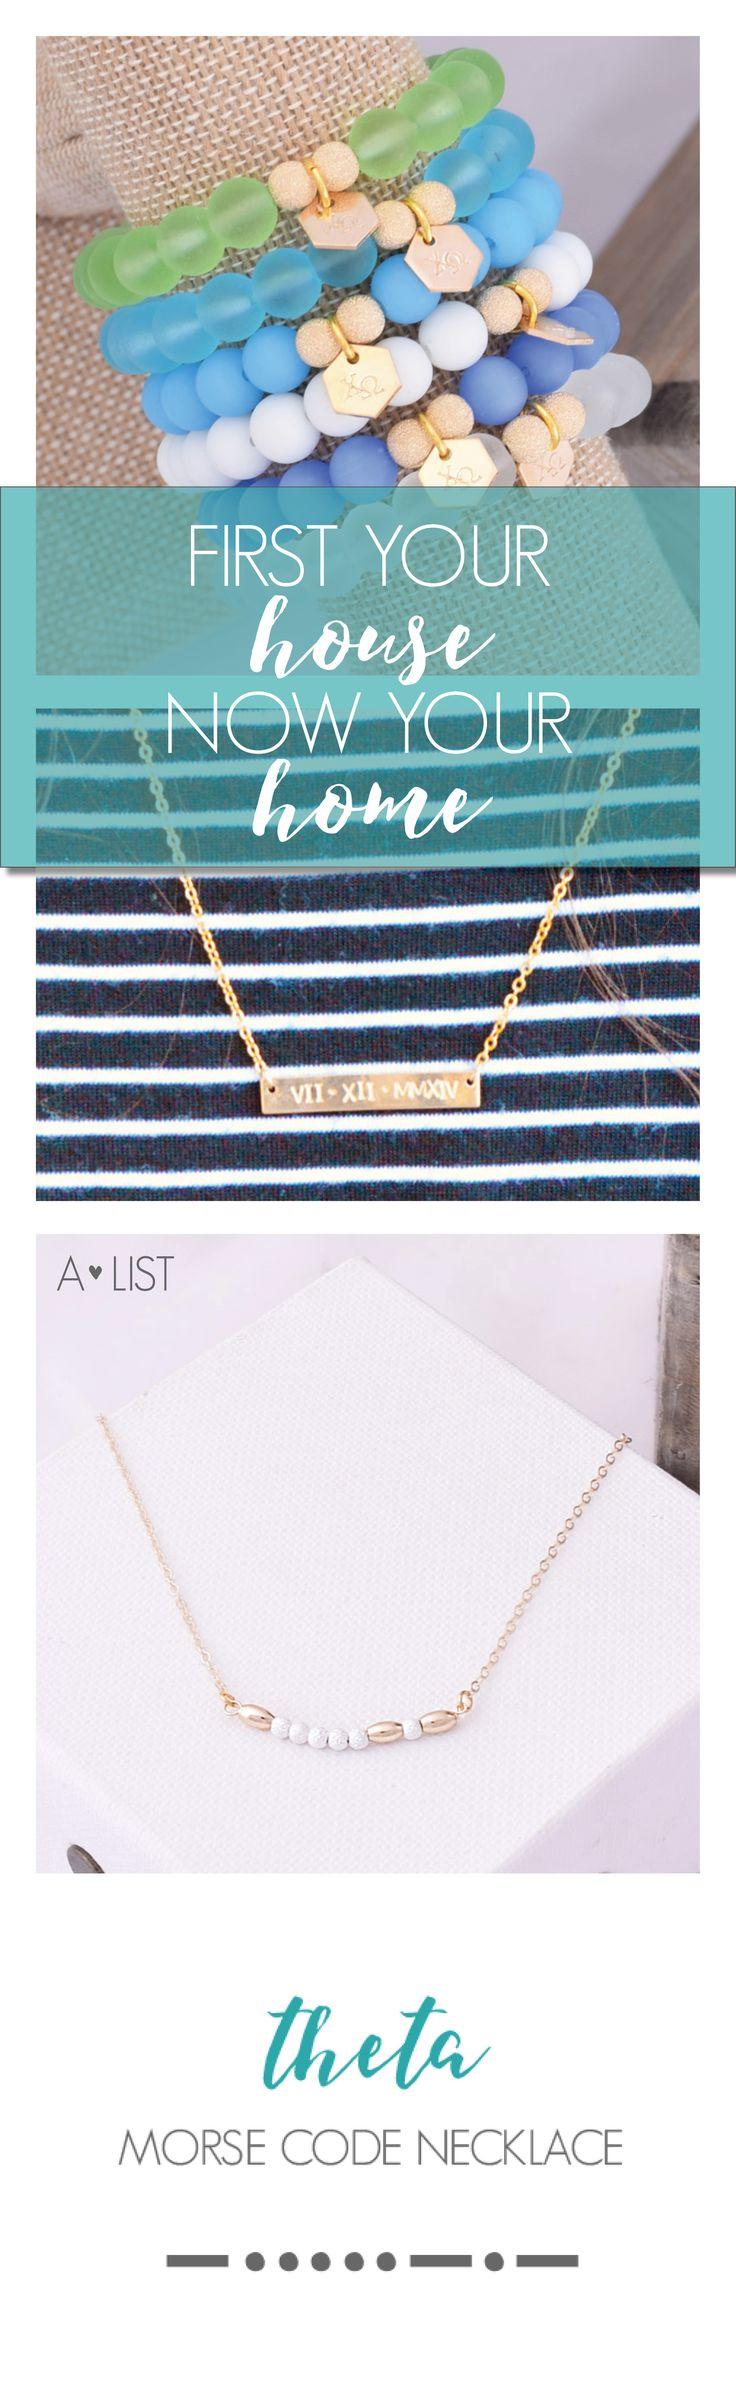 337 best Kappa Delta images on Pinterest | Sorority shirts, Sorority ...